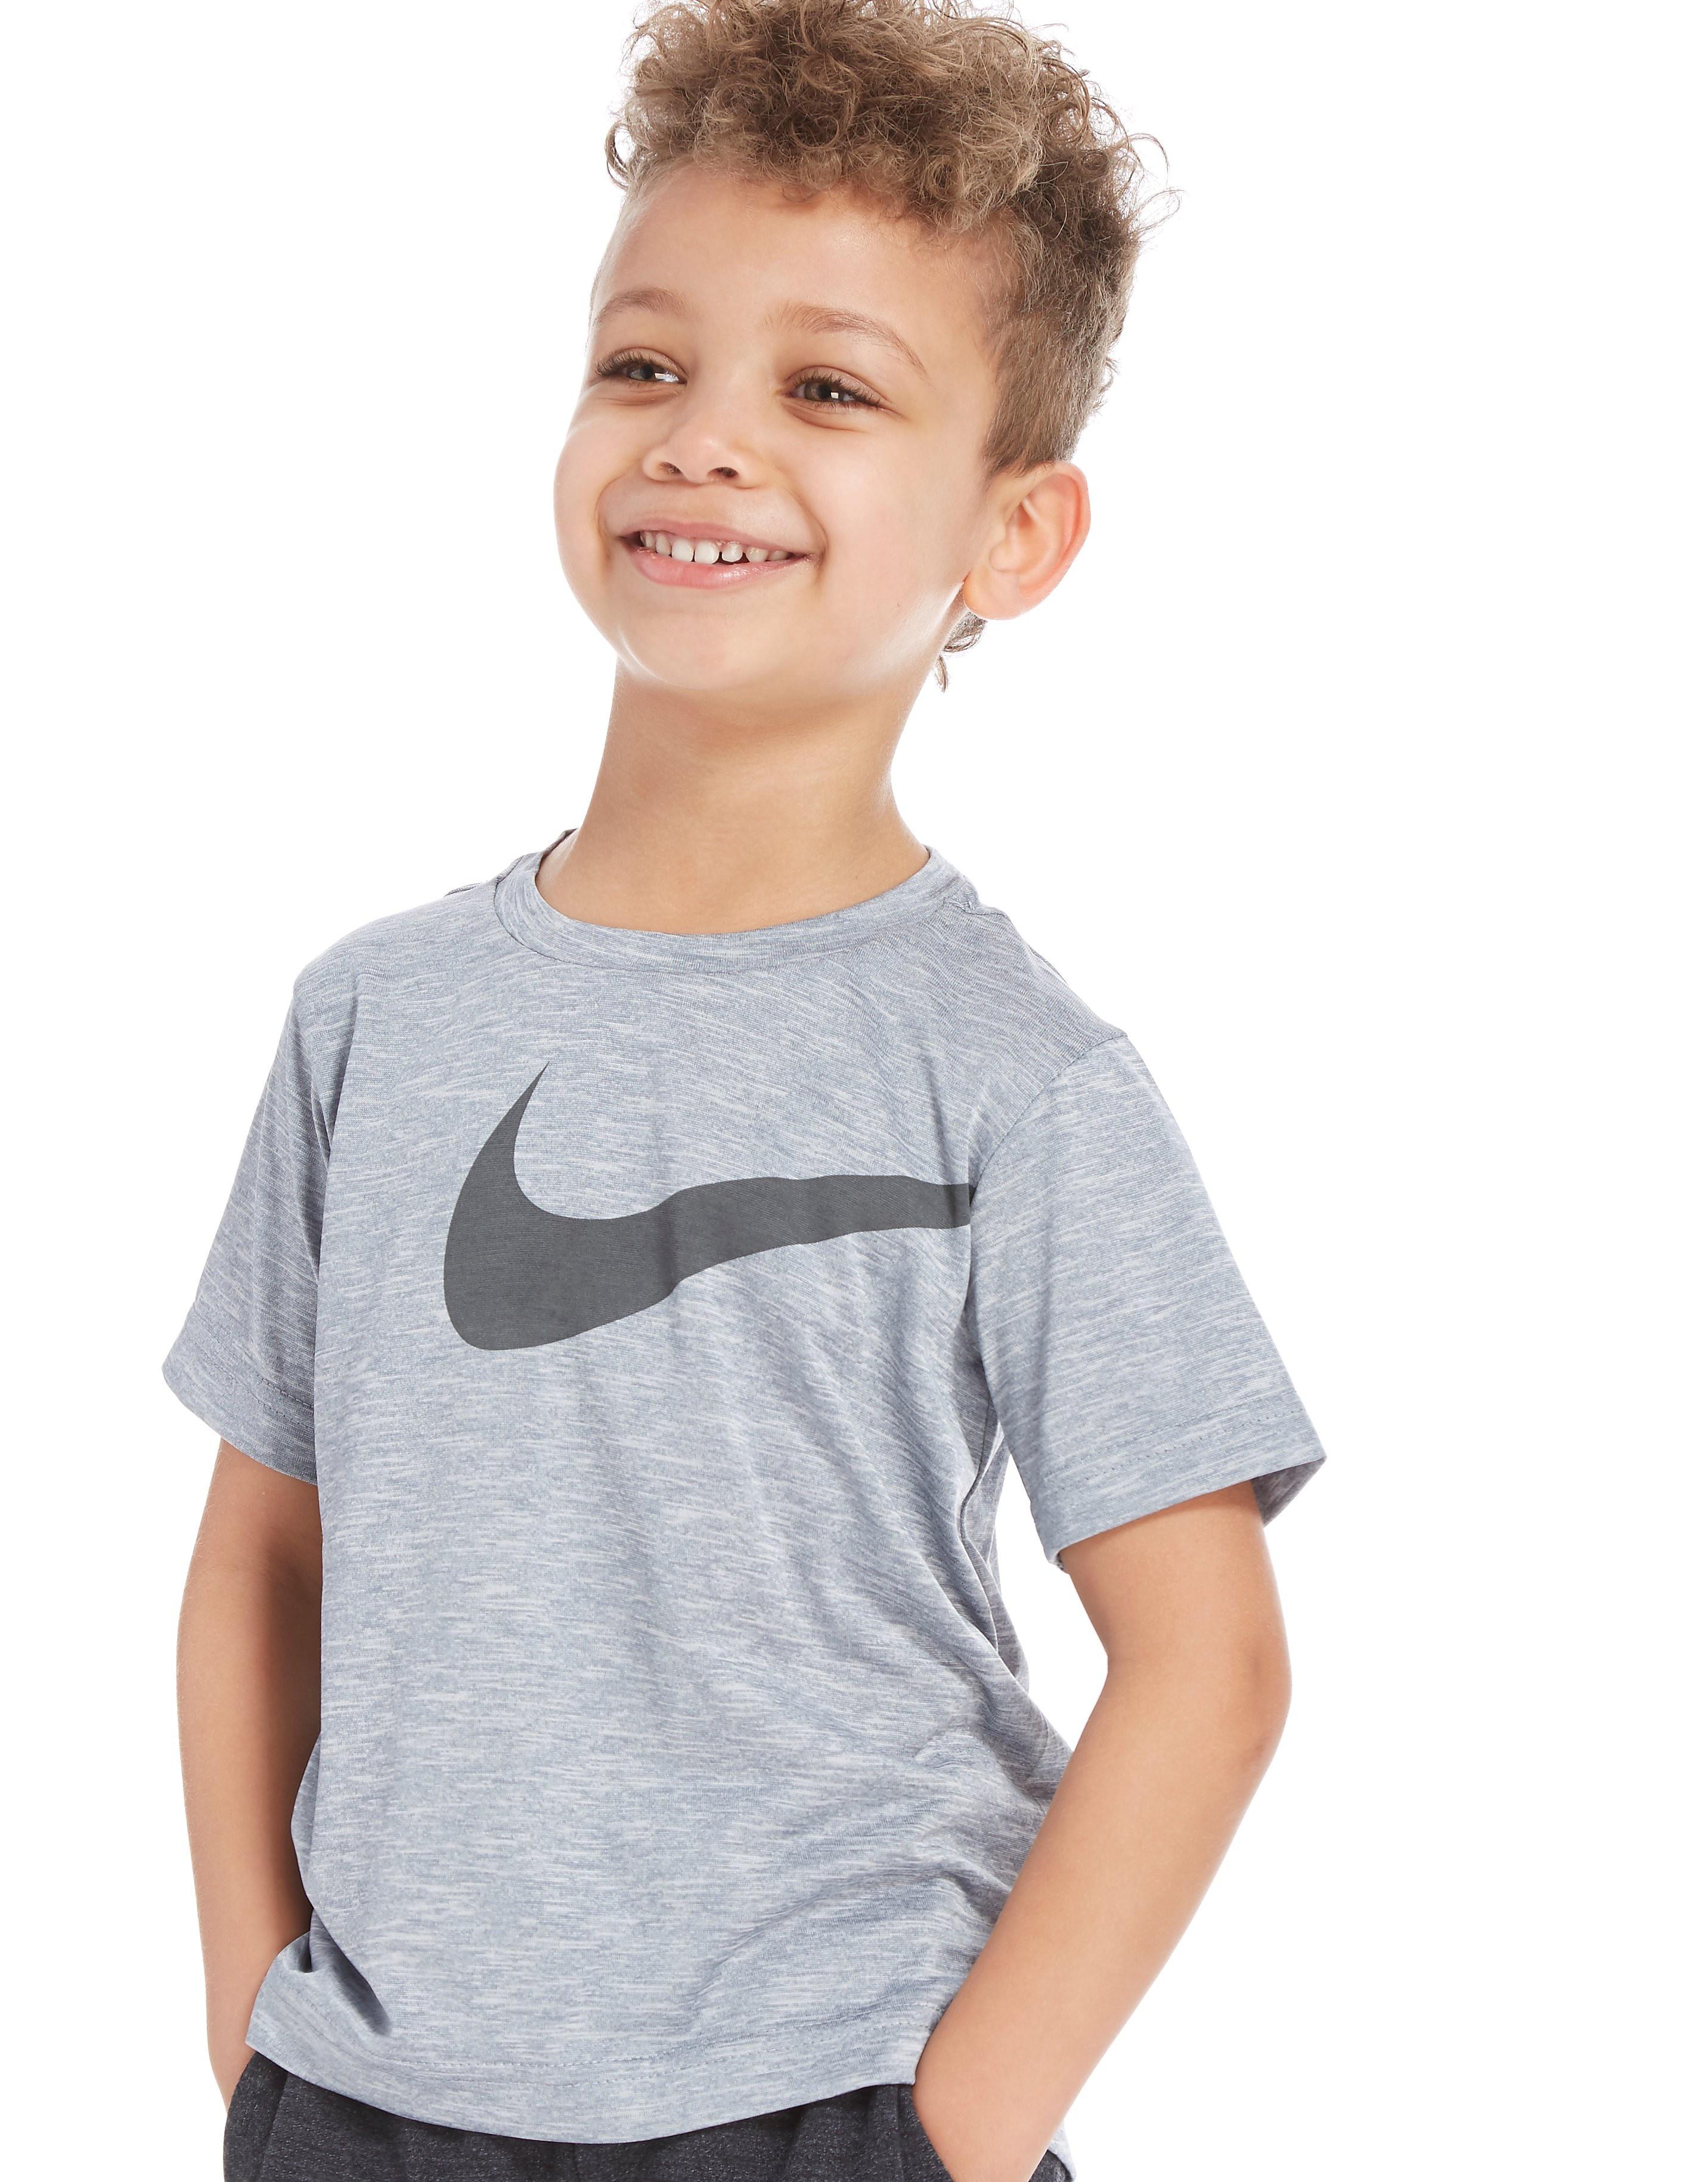 Nike Dri-FIT Short Sleeve T-Shirt Children